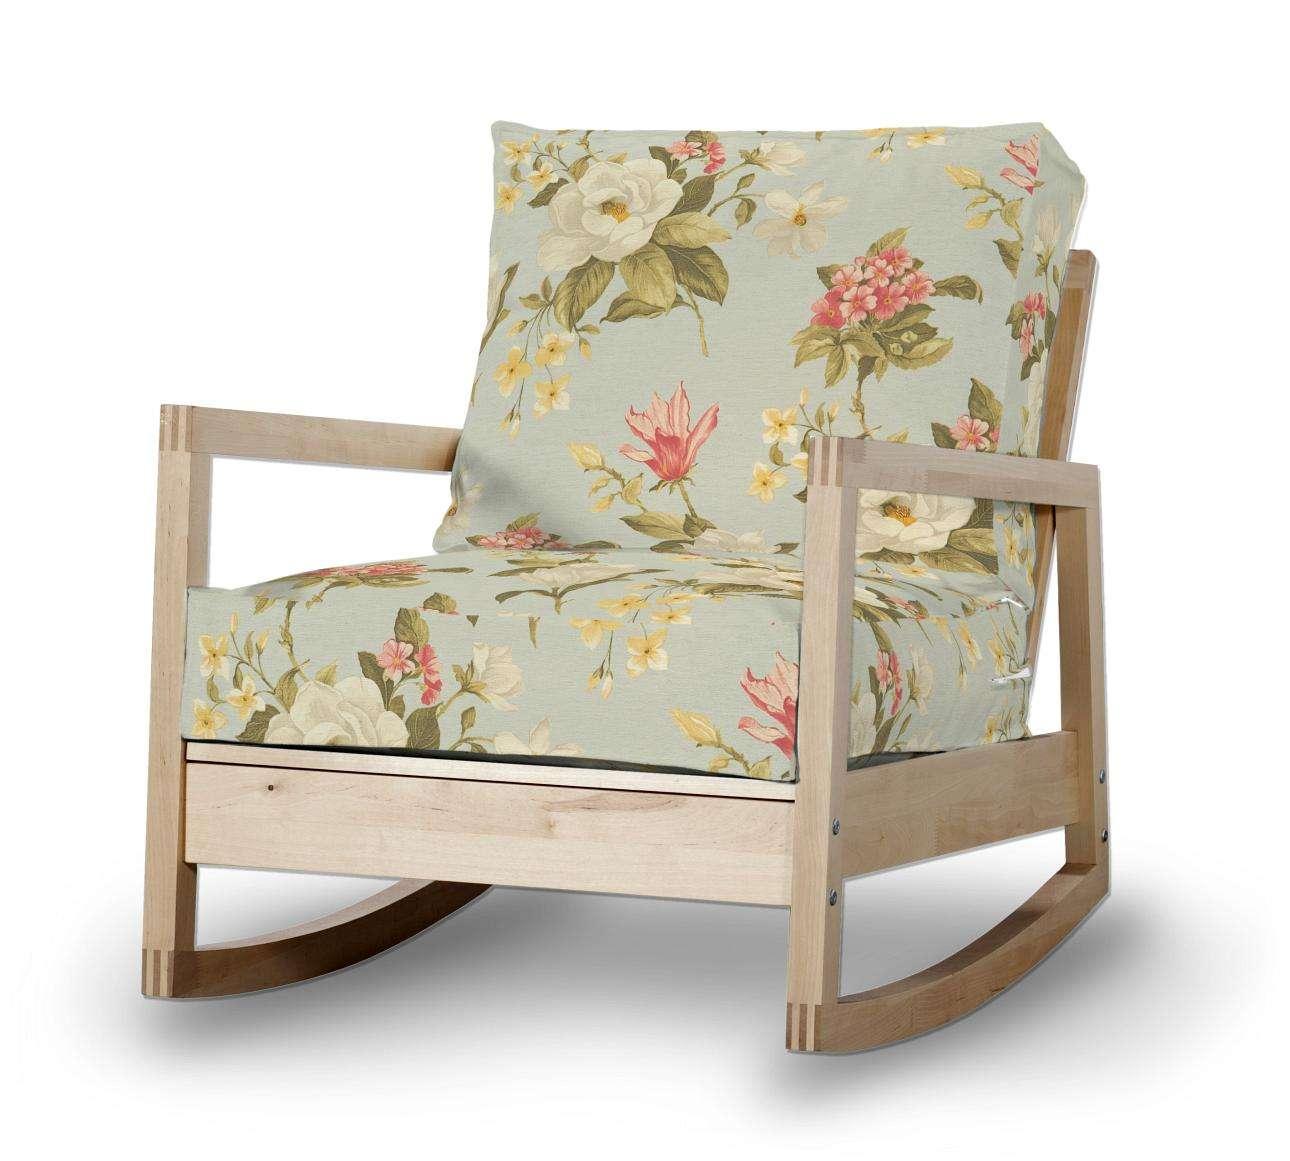 Pokrowiec na fotel Lillberg Fotel Lillberg w kolekcji Londres, tkanina: 123-65